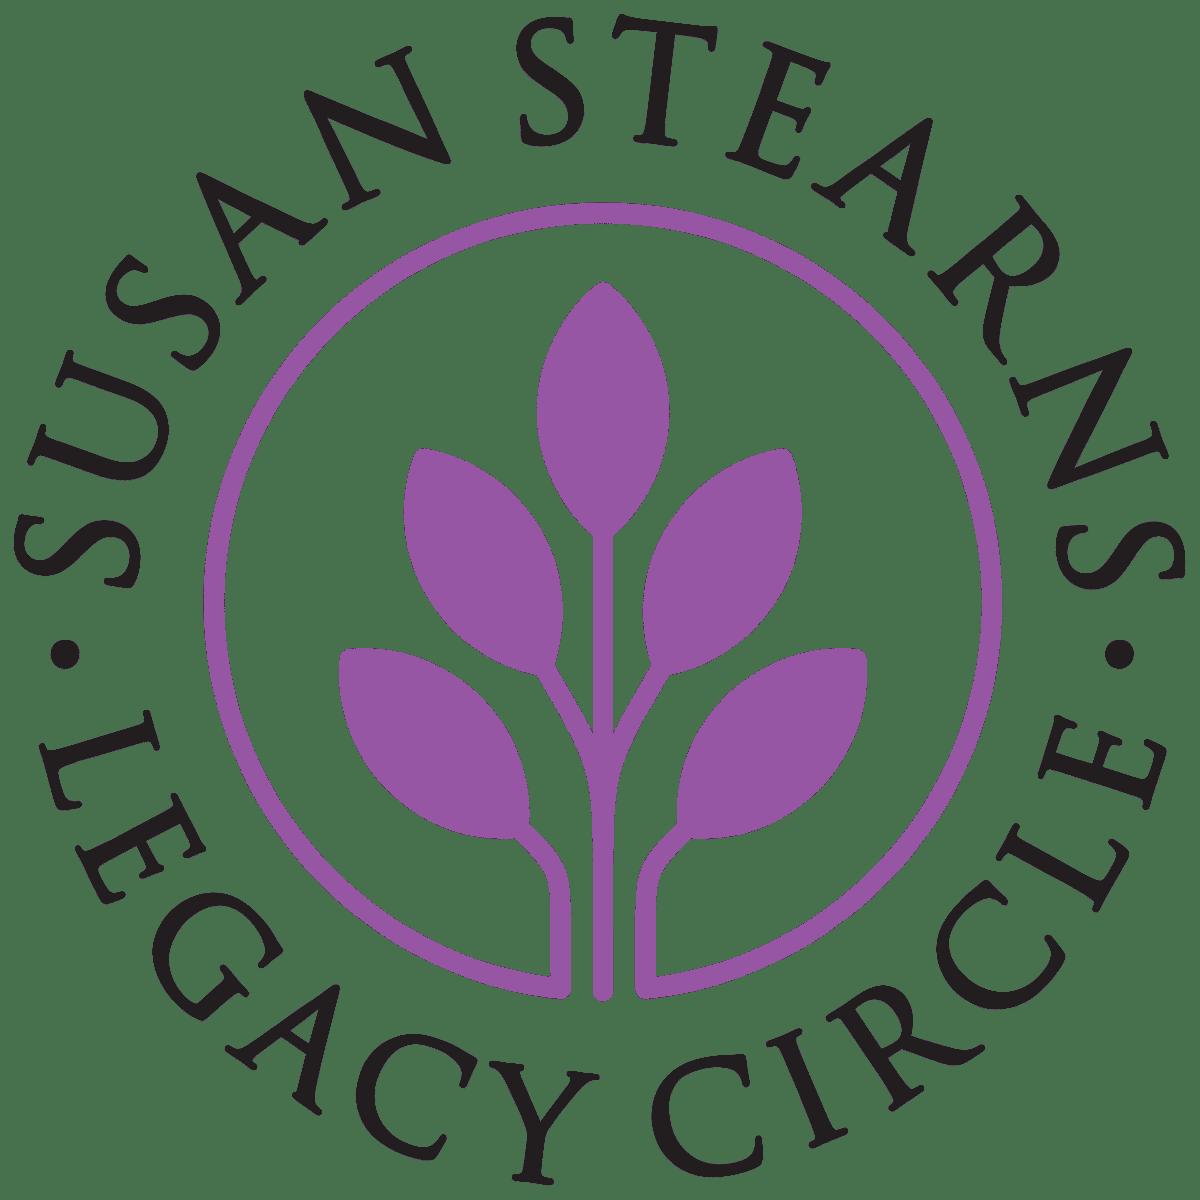 Susan Stearns Legacy Circle logo